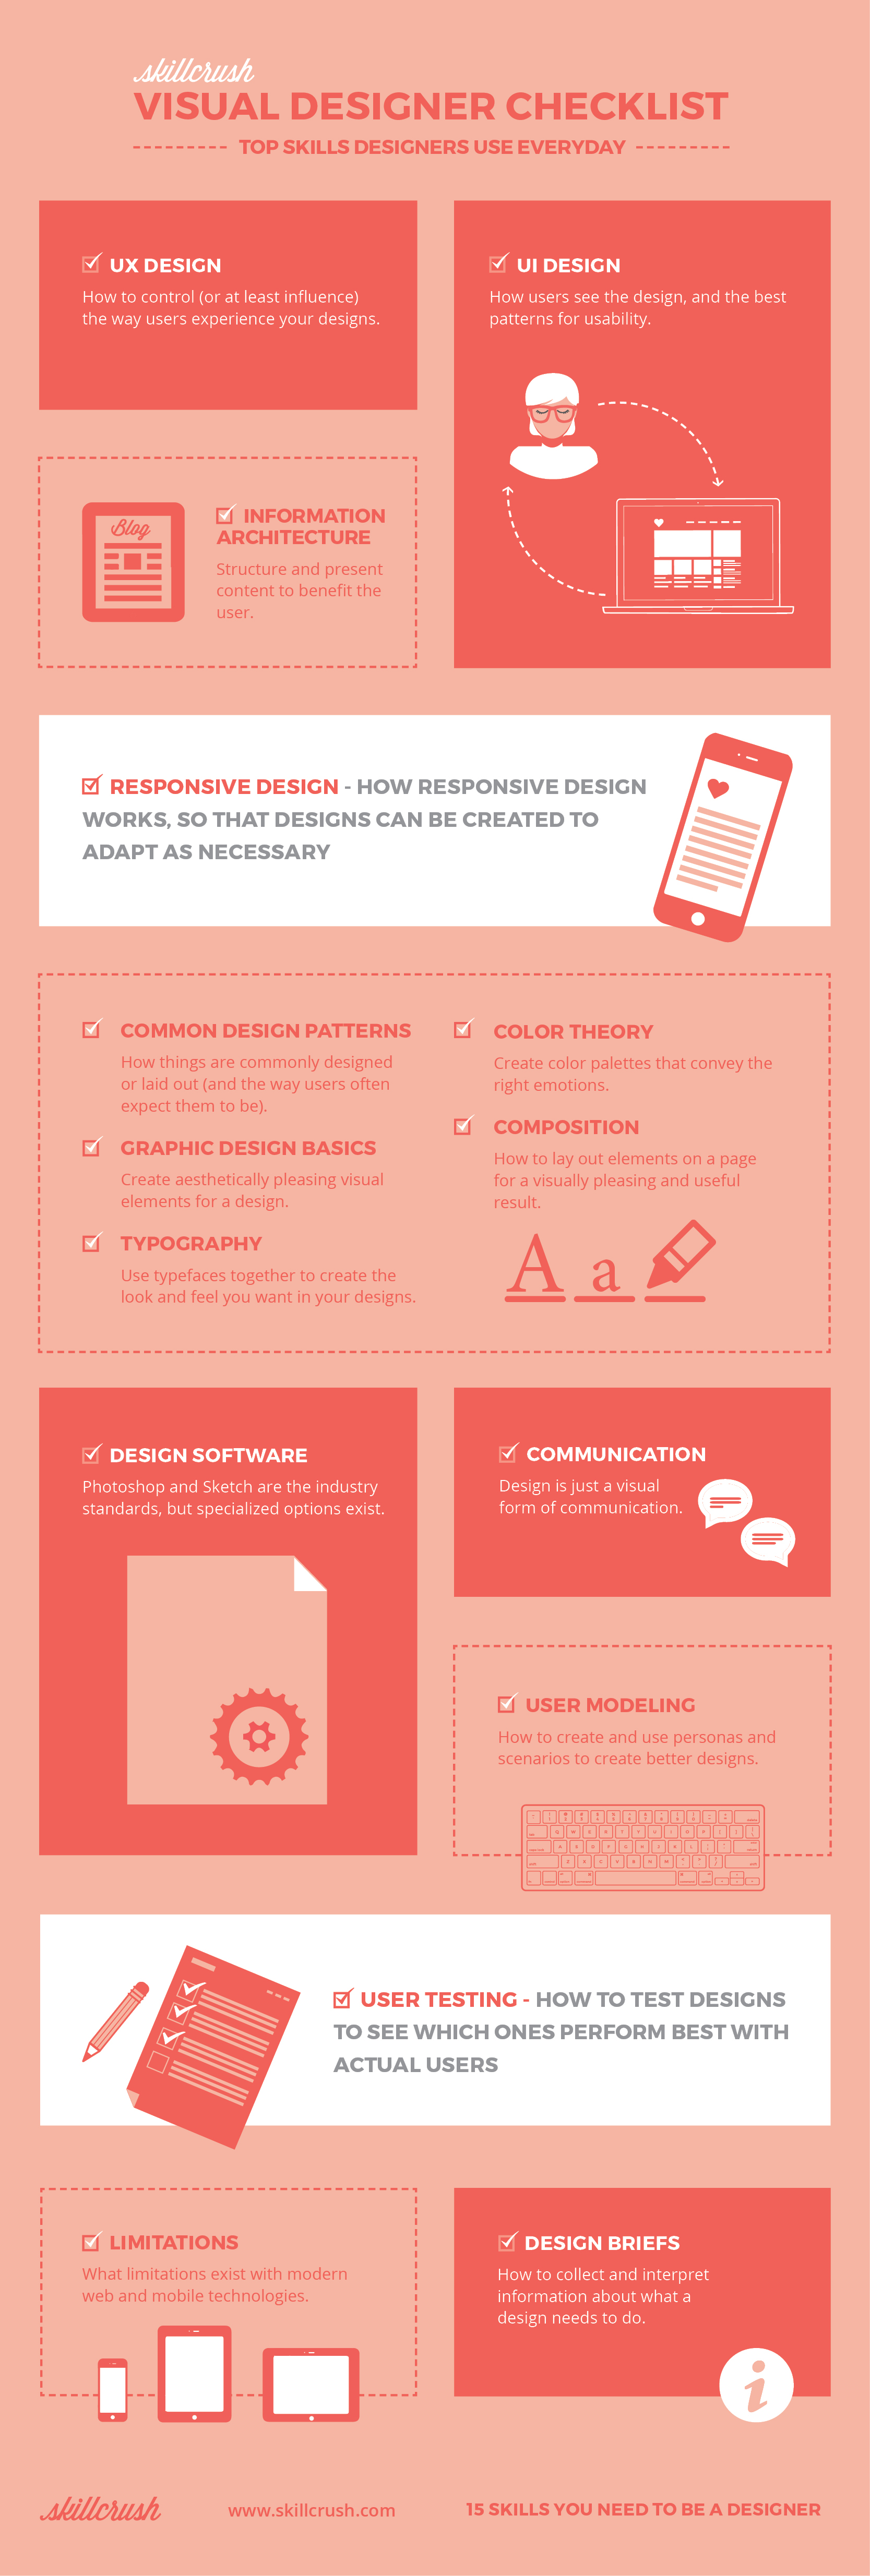 15 Skills You Need To Be A Successful Designer Skillcrush